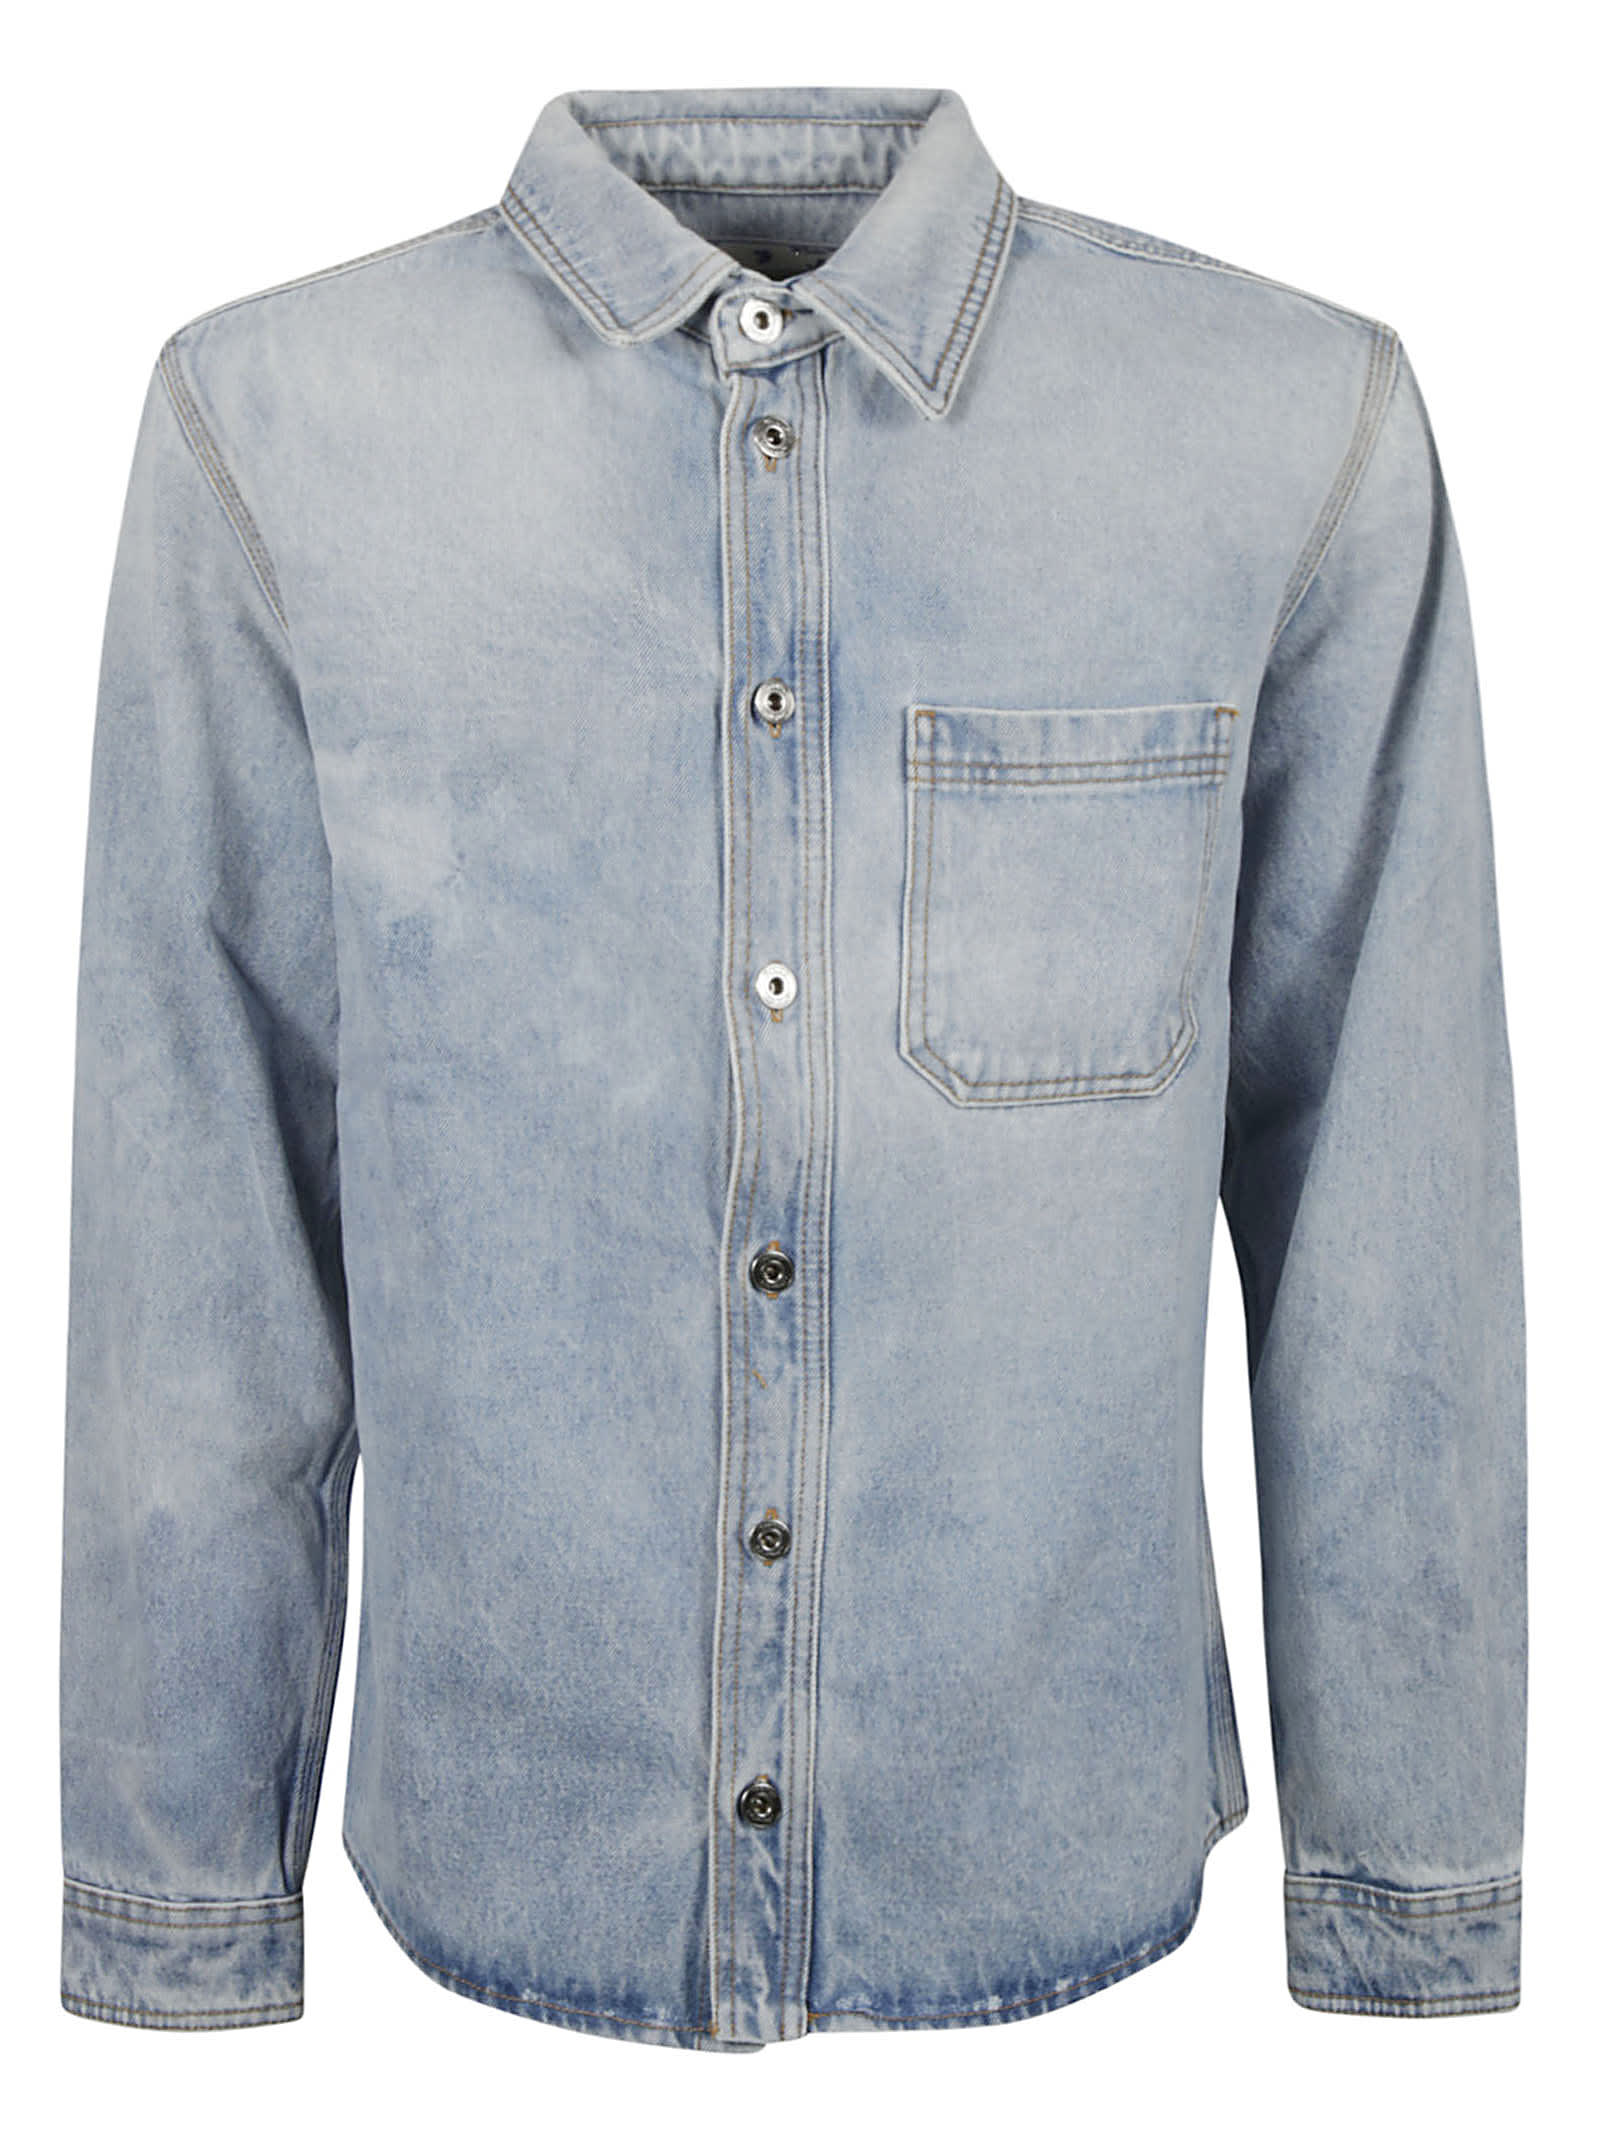 Off-white Negative Mark Denim Shirt In Bleach Blue/white